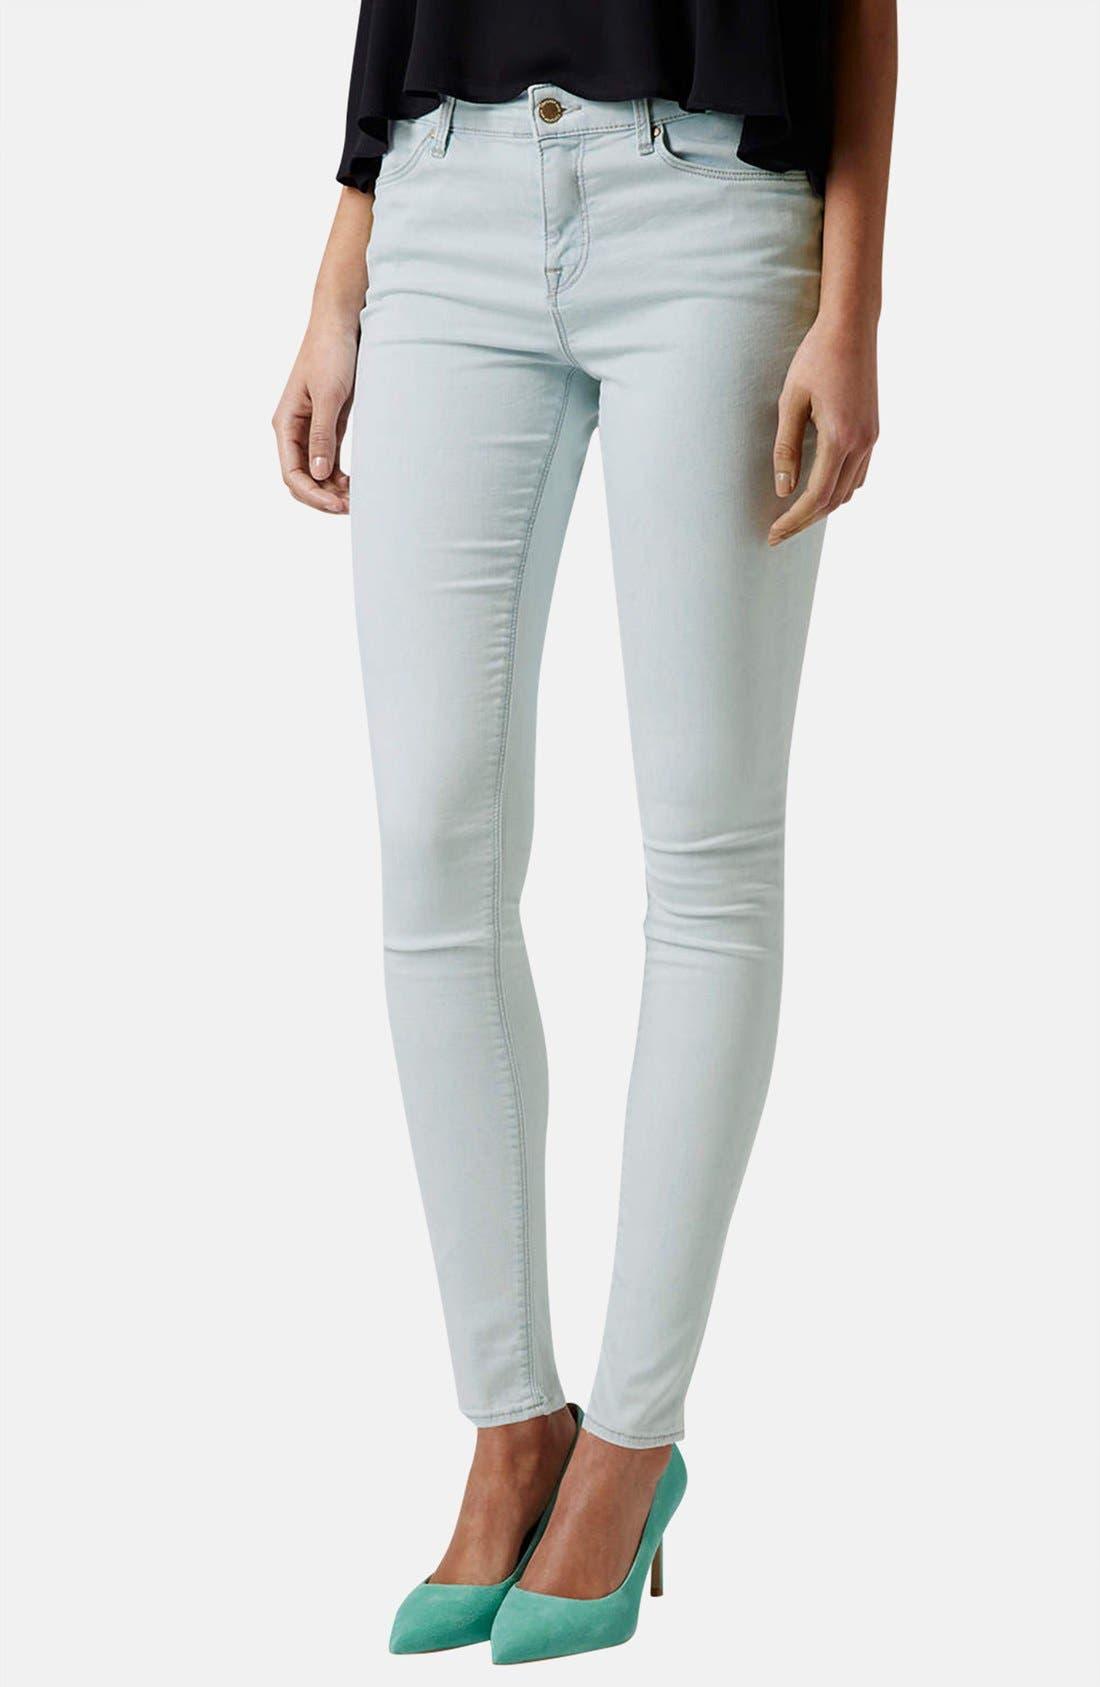 Alternate Image 1 Selected - Topshop Moto 'Leigh' Mid Rise Skinny Jeans (Light Denim)